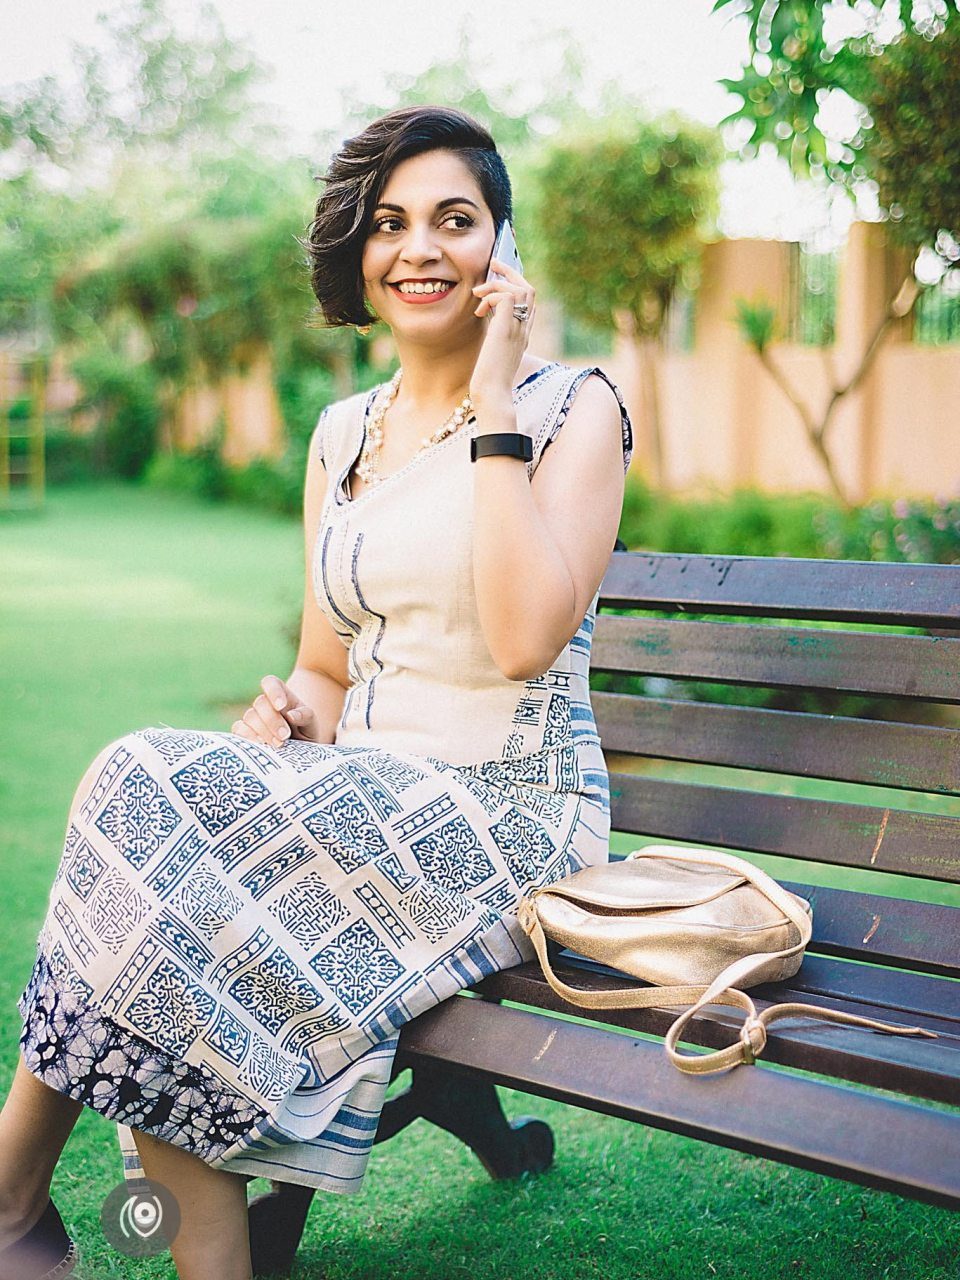 Naina.co-Professionalism-Phone-Calls-Scheduled